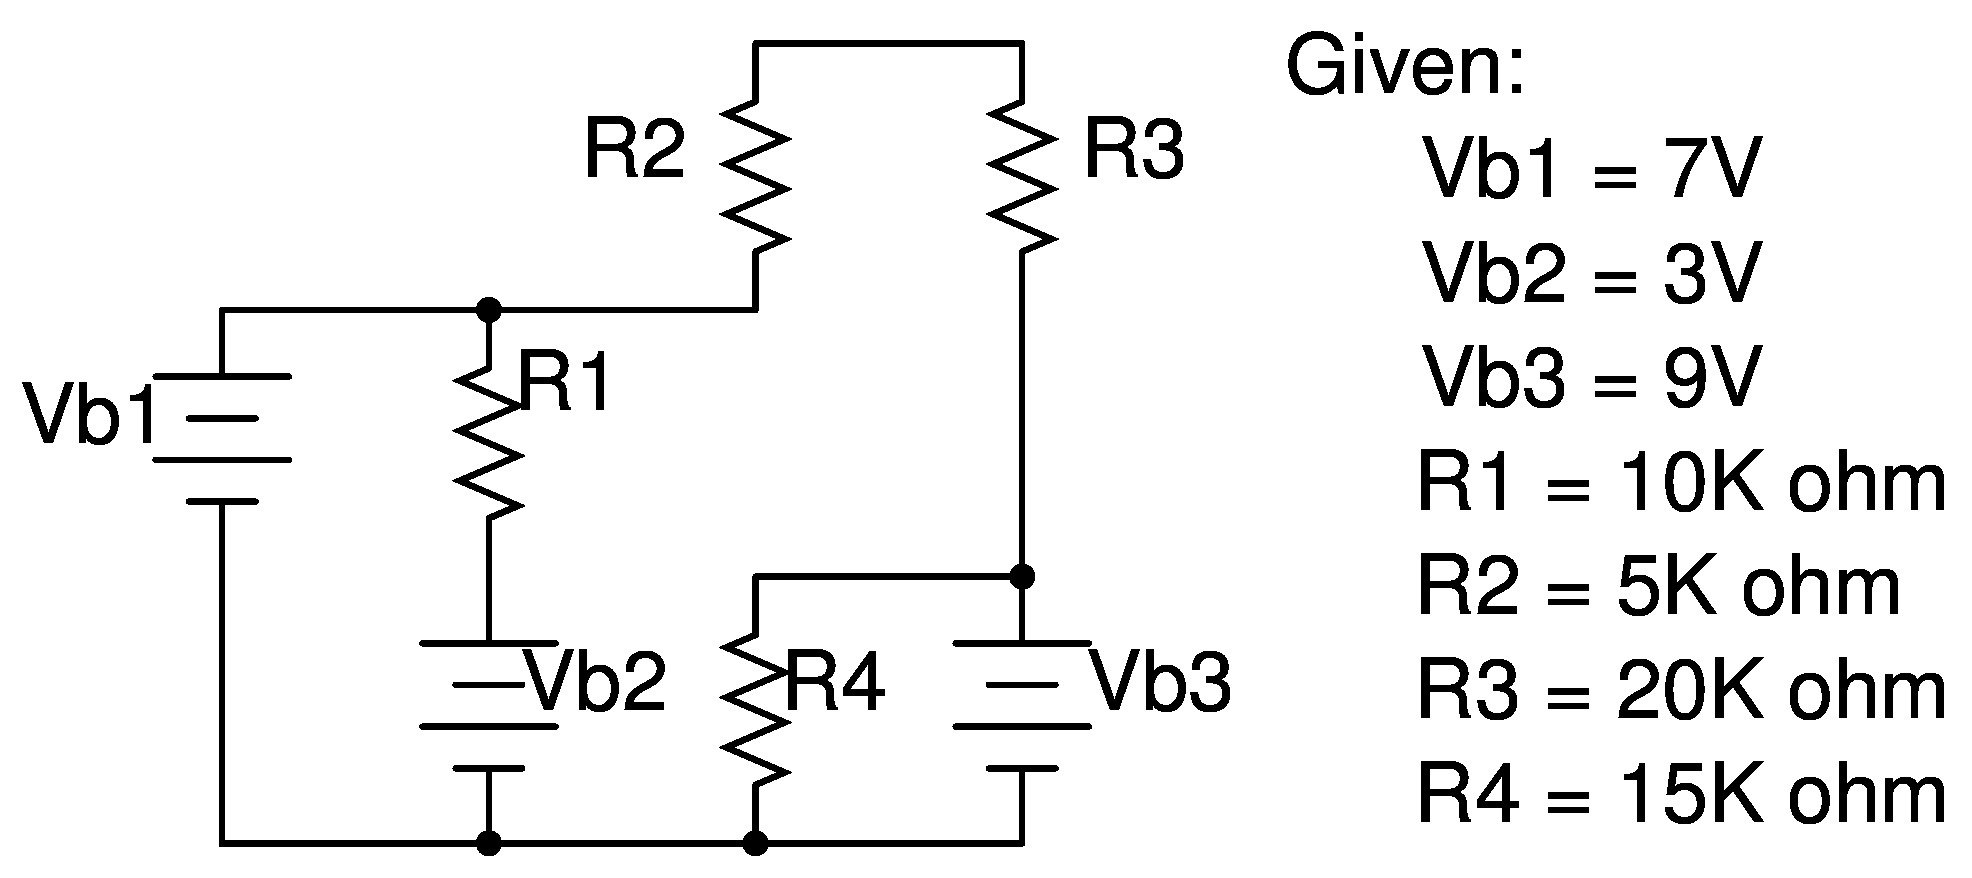 Circuit Diagram Exercises Data Wiring Blog Of Boolean Algebra Calculator Library Maker